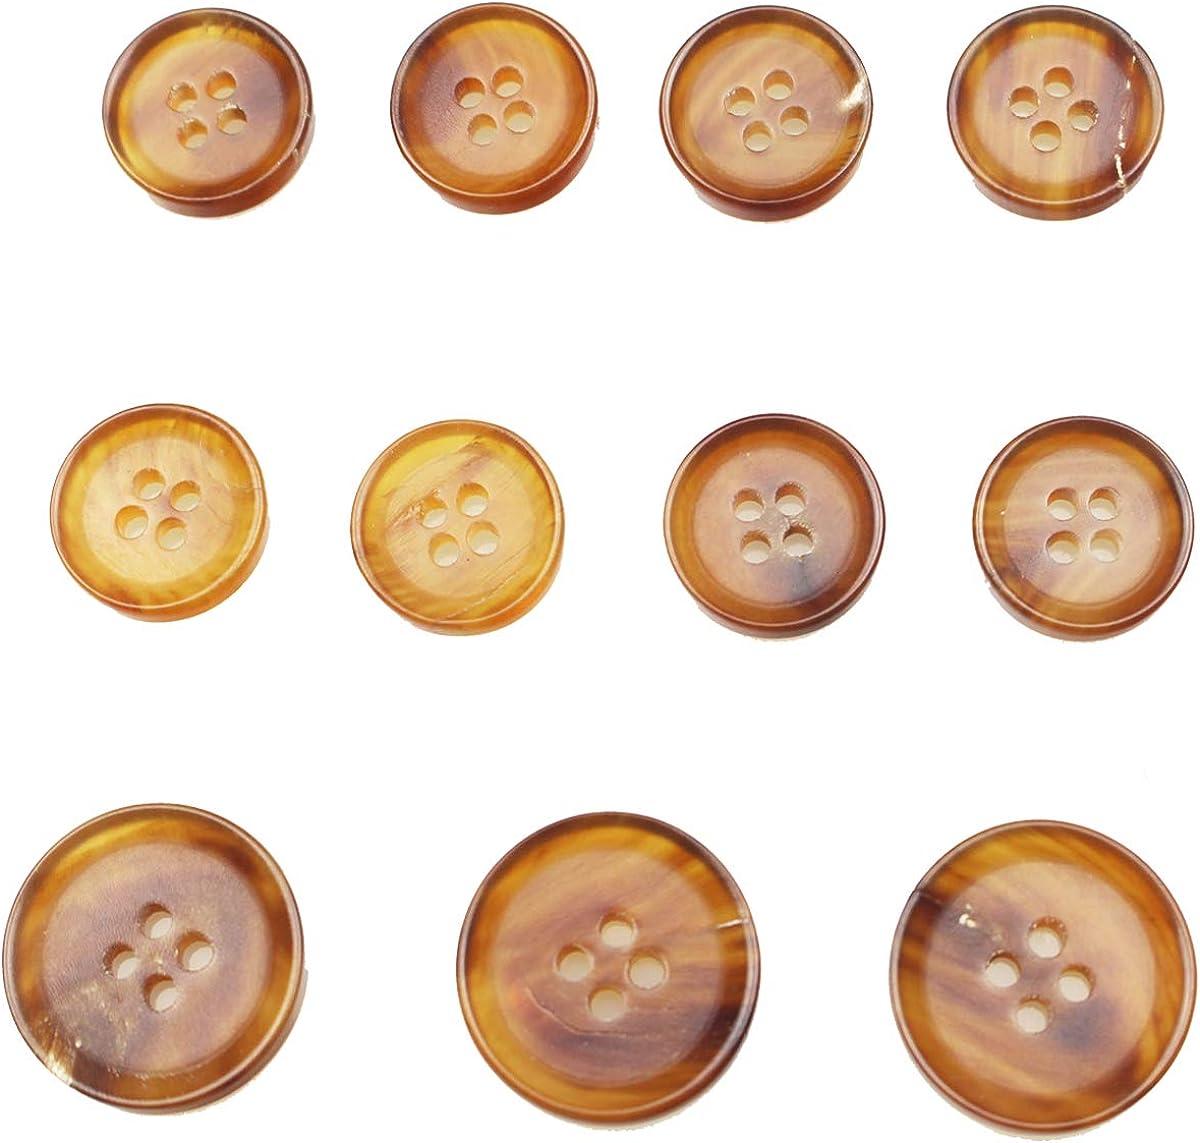 11 Pieces Genuine Natural Horn Blazer & Suits Button Set - for Blazer, Sport Coat, Uniform, Jacket (Light Brown)